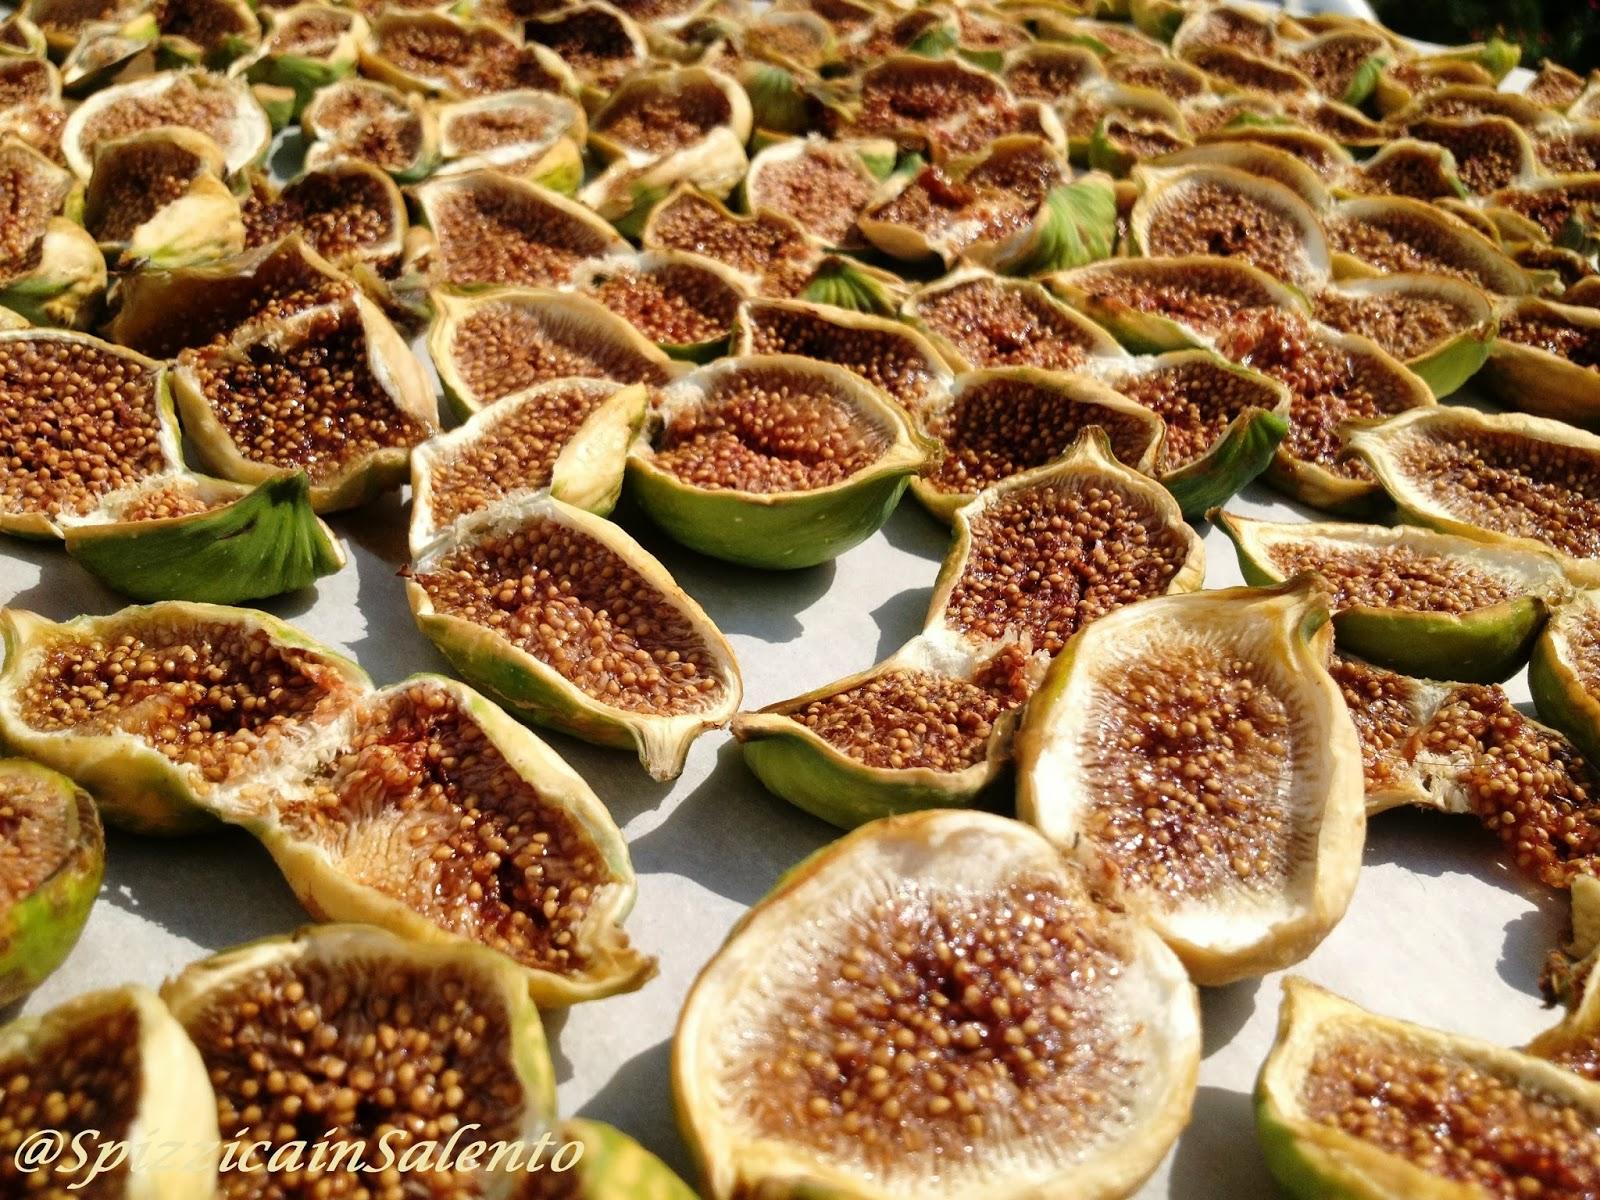 combien de figues peut on manger par jour stunning image intitule eat a fig step with combien. Black Bedroom Furniture Sets. Home Design Ideas